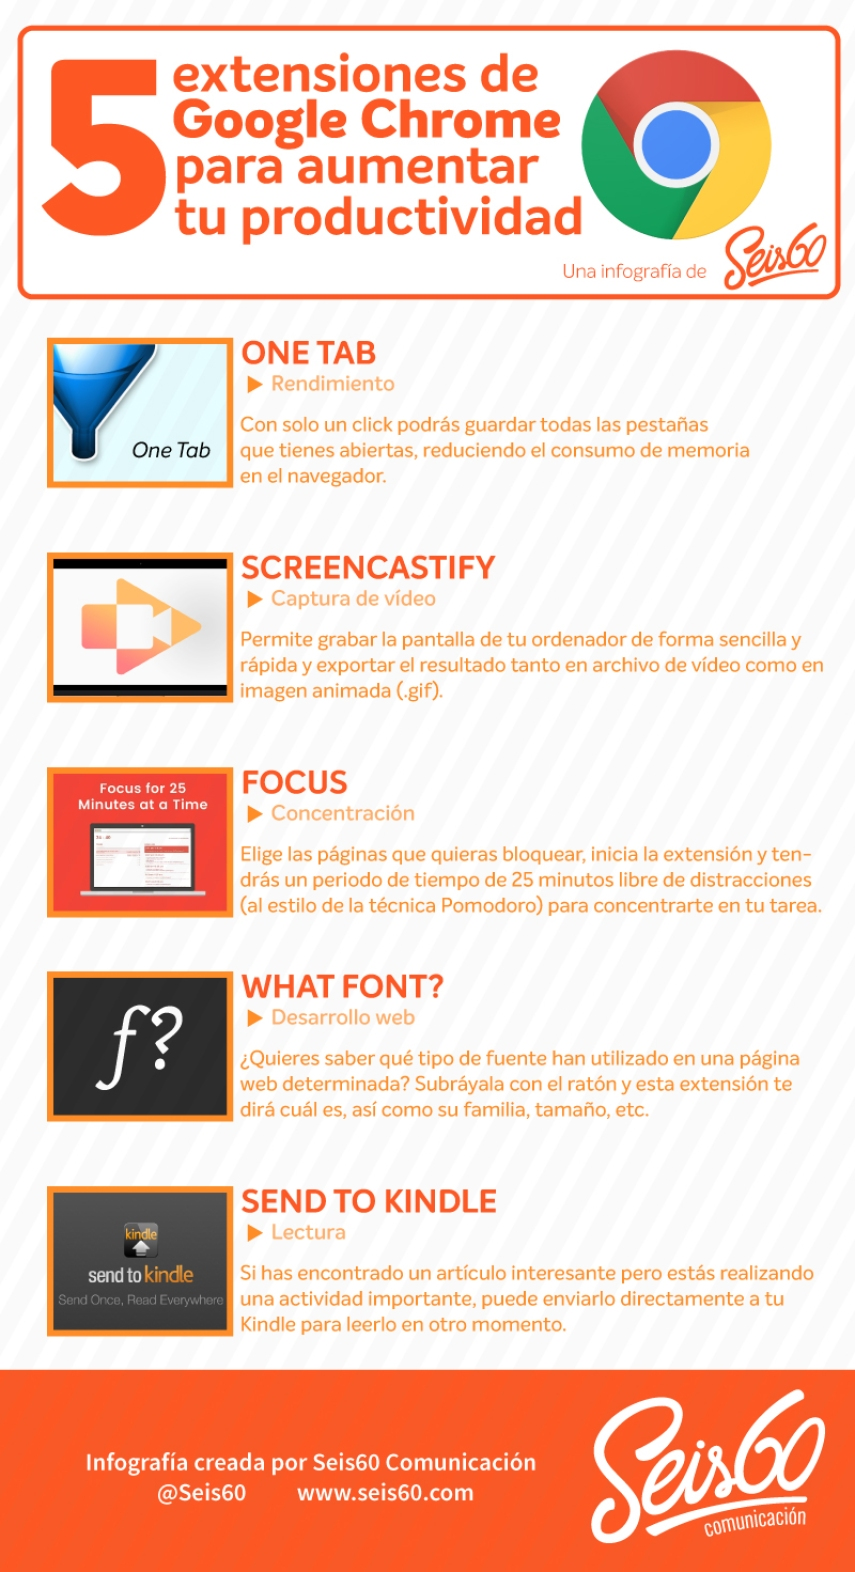 5 extensiones de Google Chrome para aumentar tu productividad